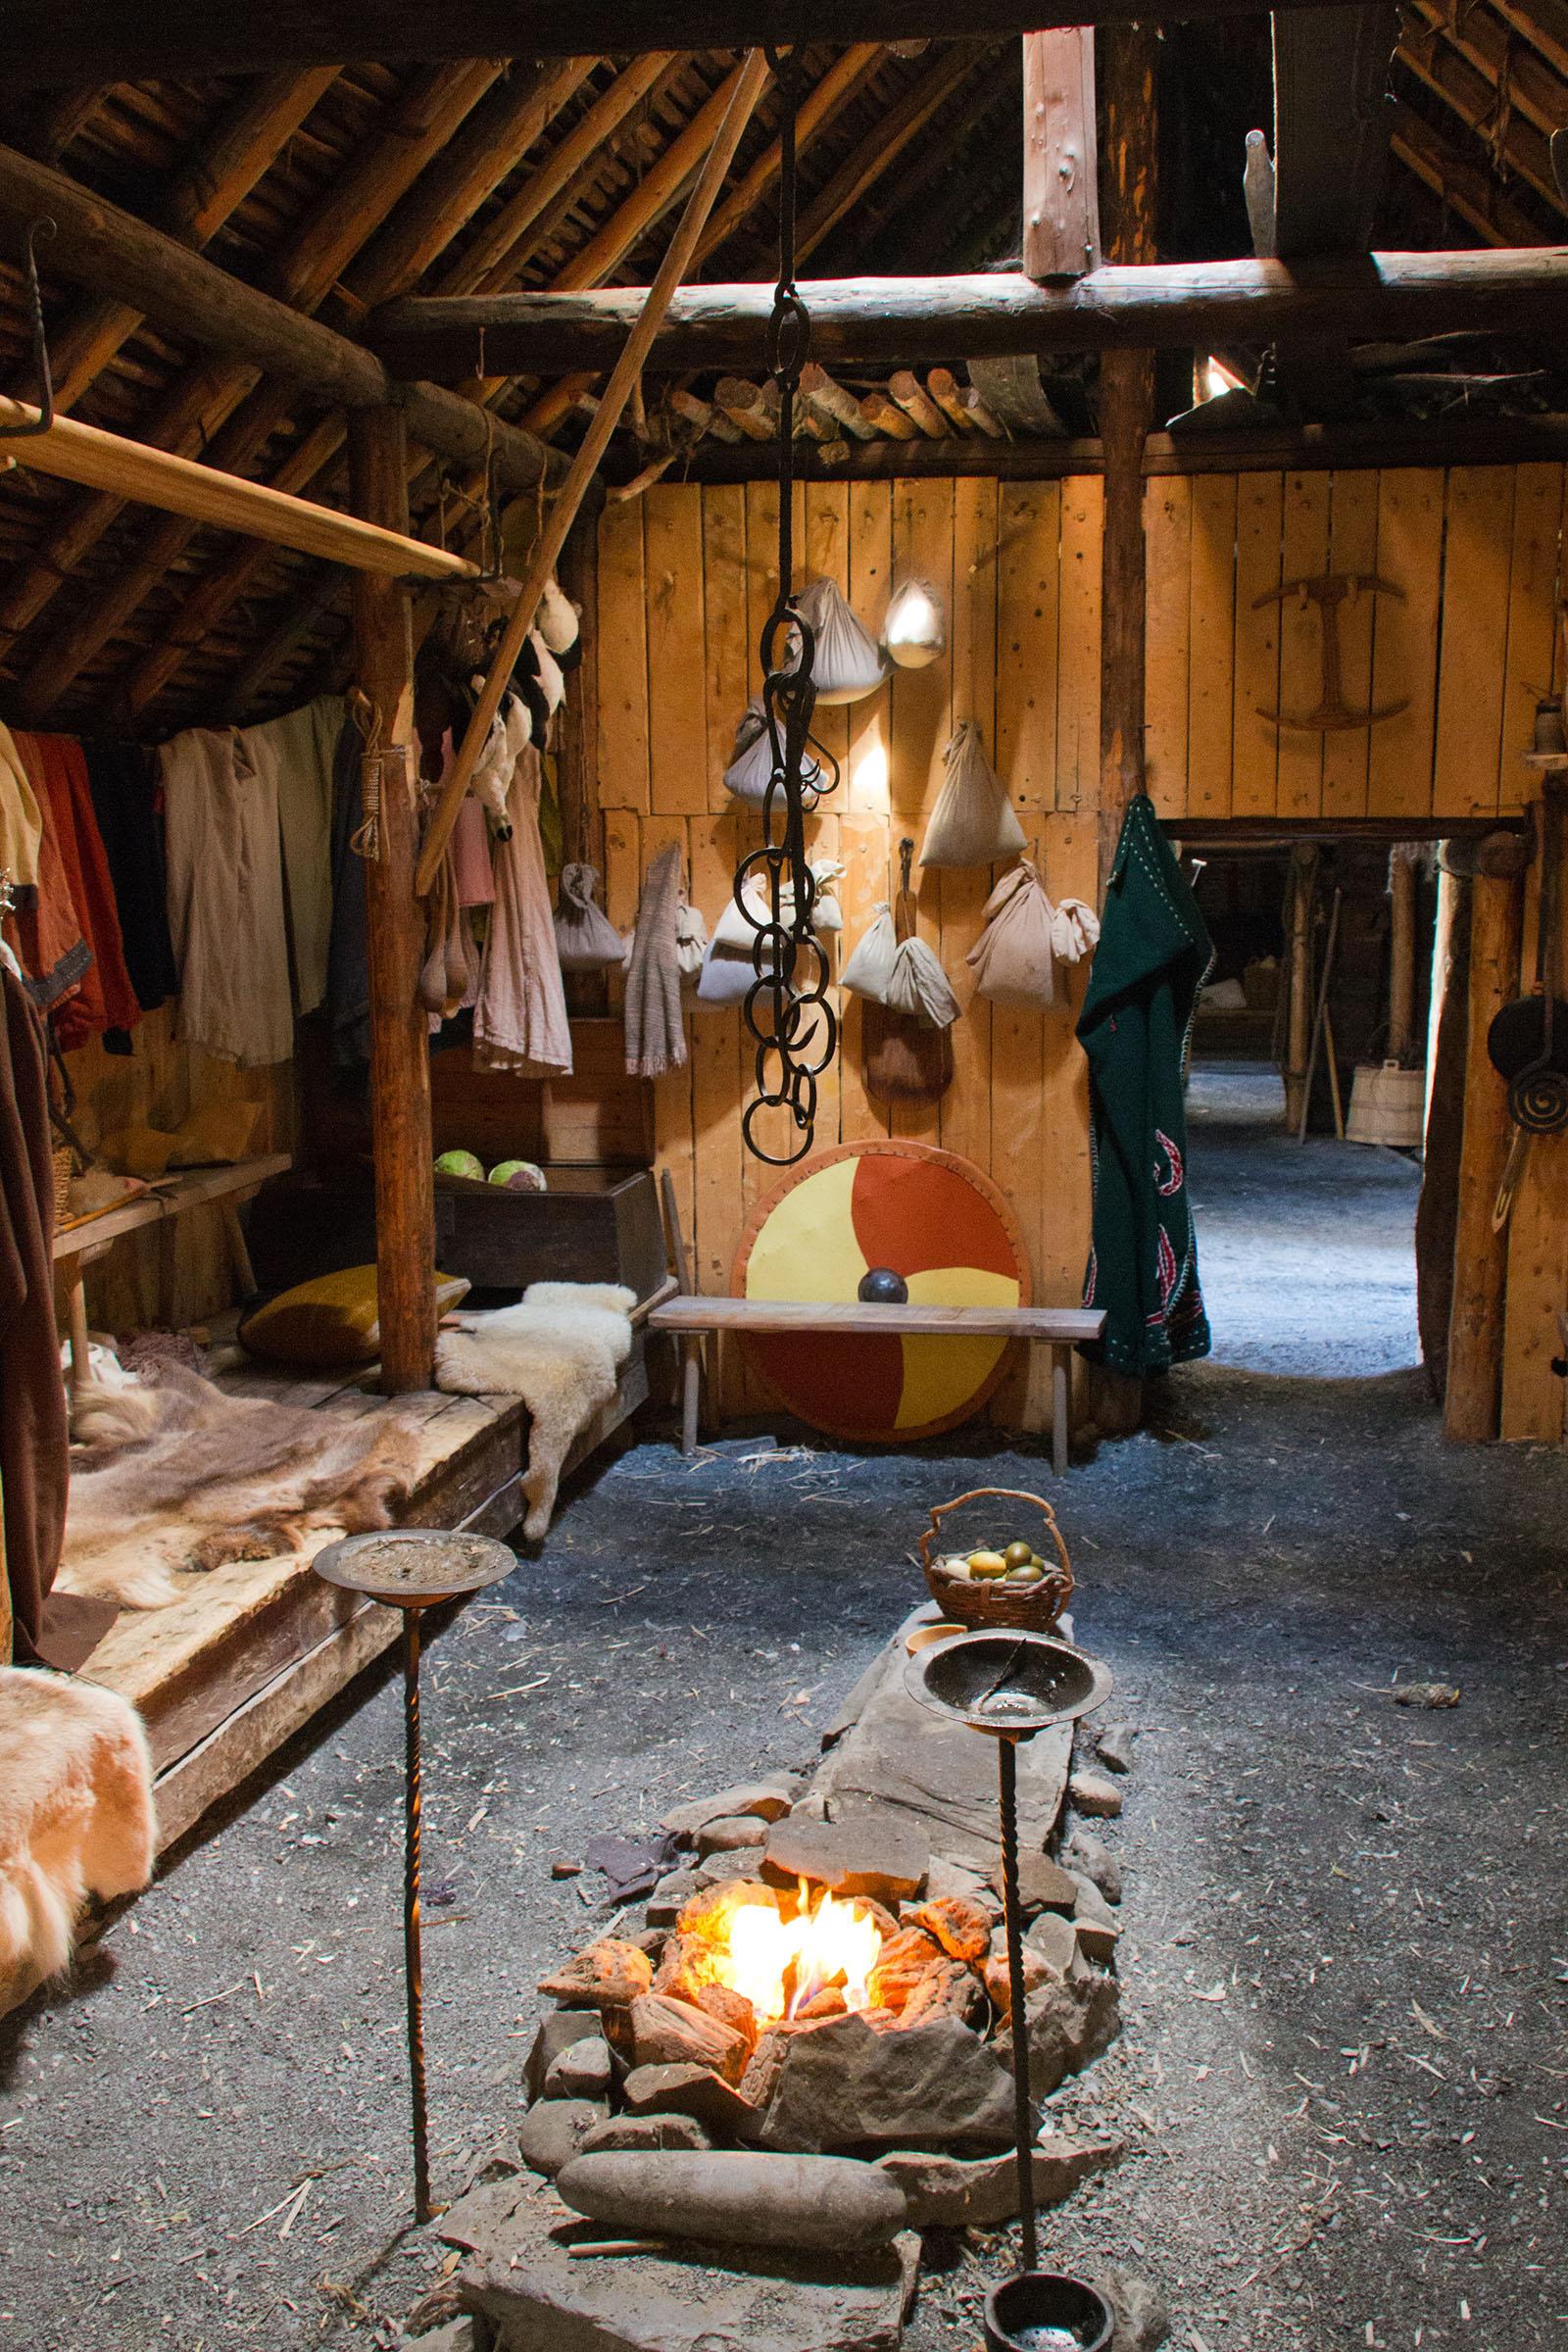 Viking longhouse, Rural, Scandinavia, Scandinavian, Scene, HQ Photo